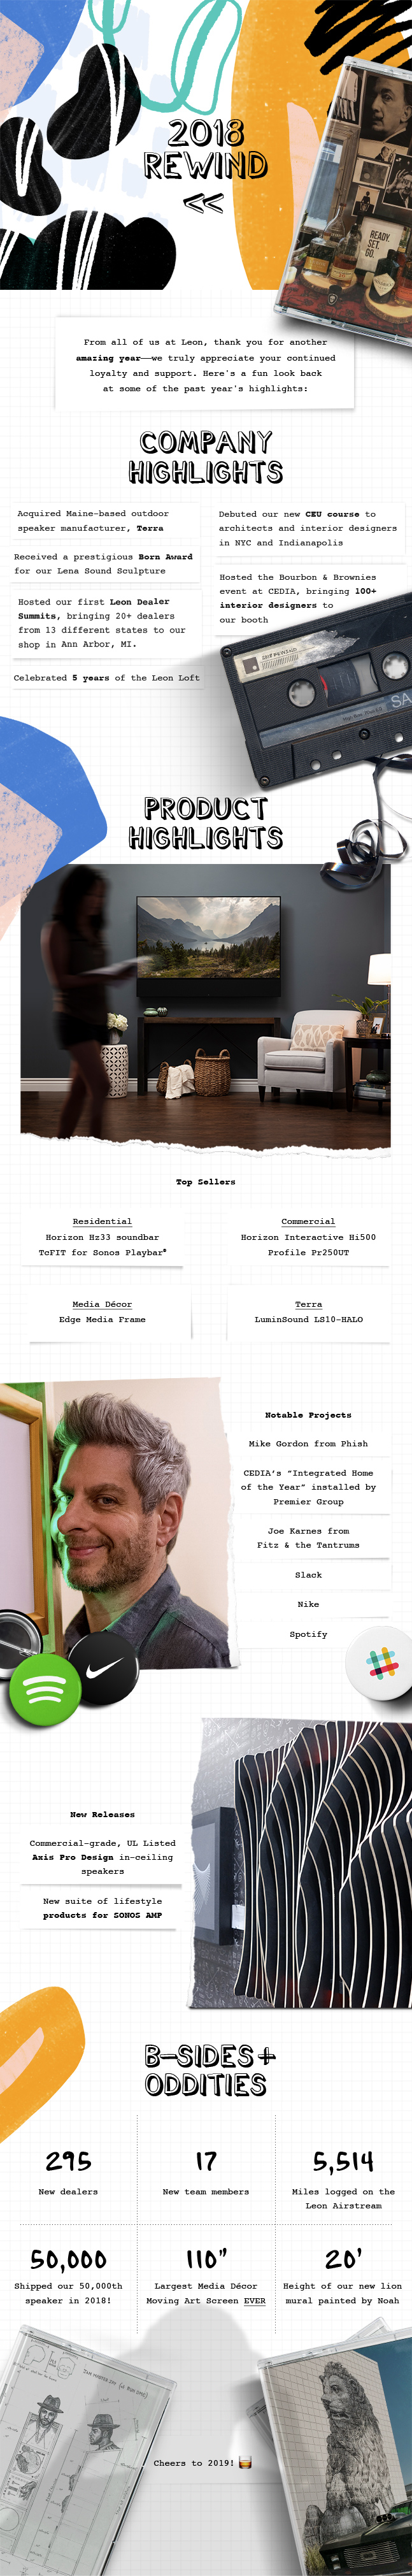 Leon-Speakers-2018-Rewind.jpg